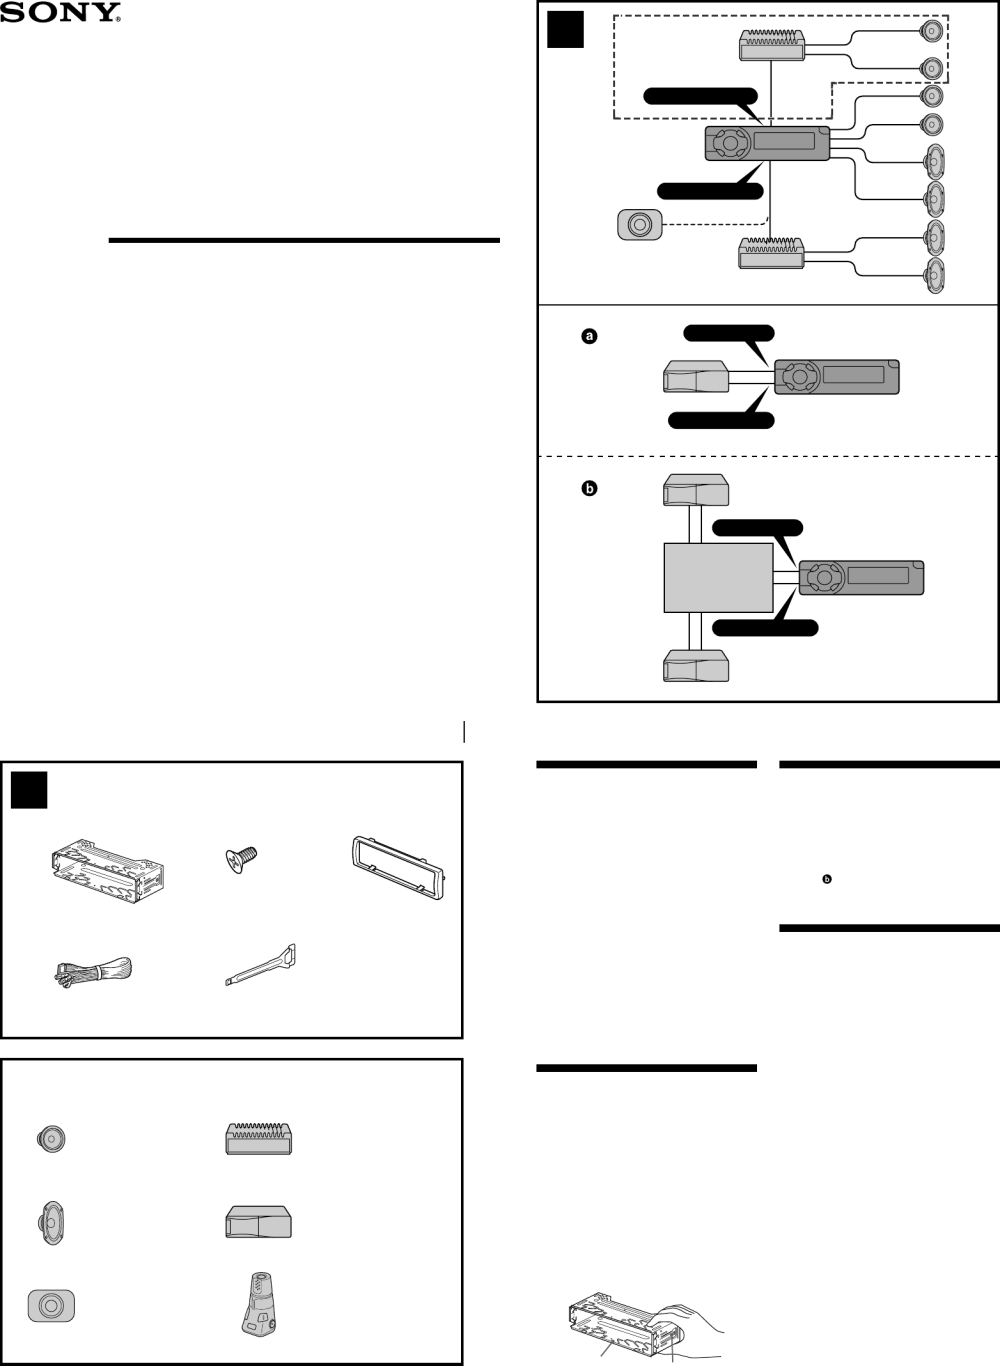 medium resolution of sony cdx f5500 wiring diagram